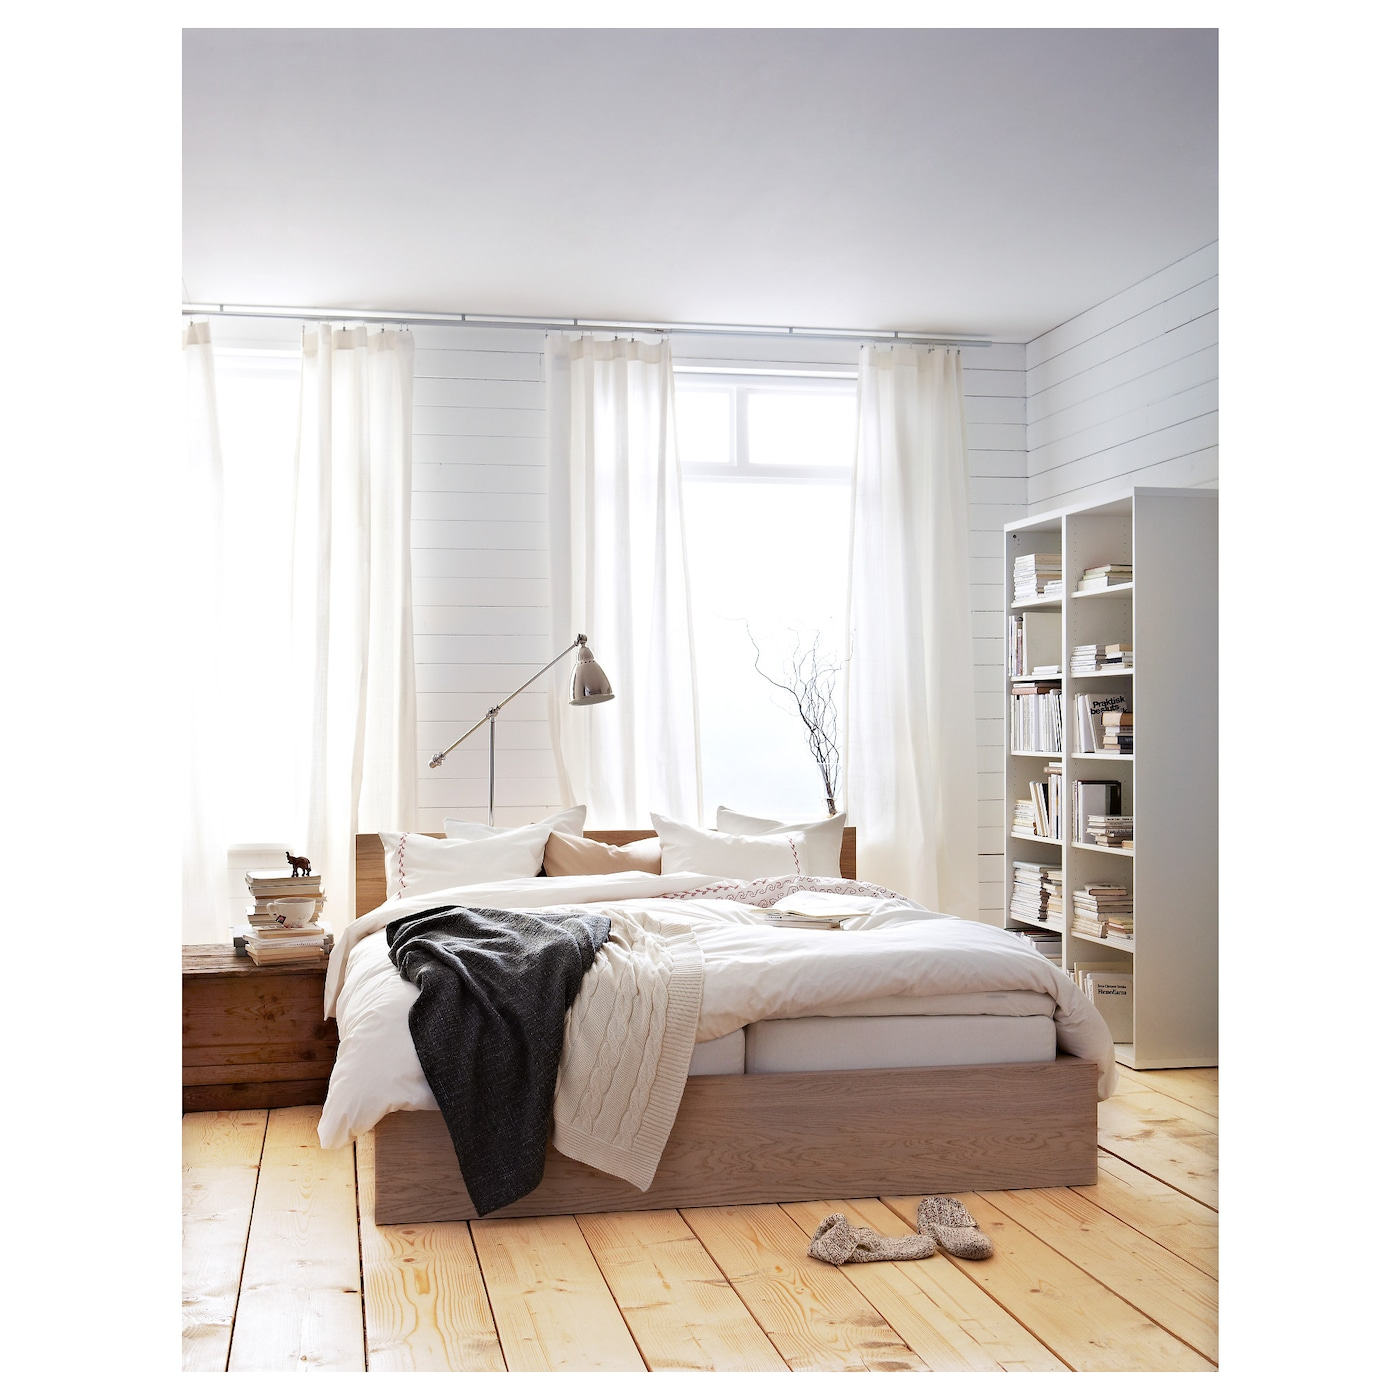 Malm estructura de cama alta chapa roble tinte blanco l nset 140 x 200 cm ikea - Ikea cama alta ...